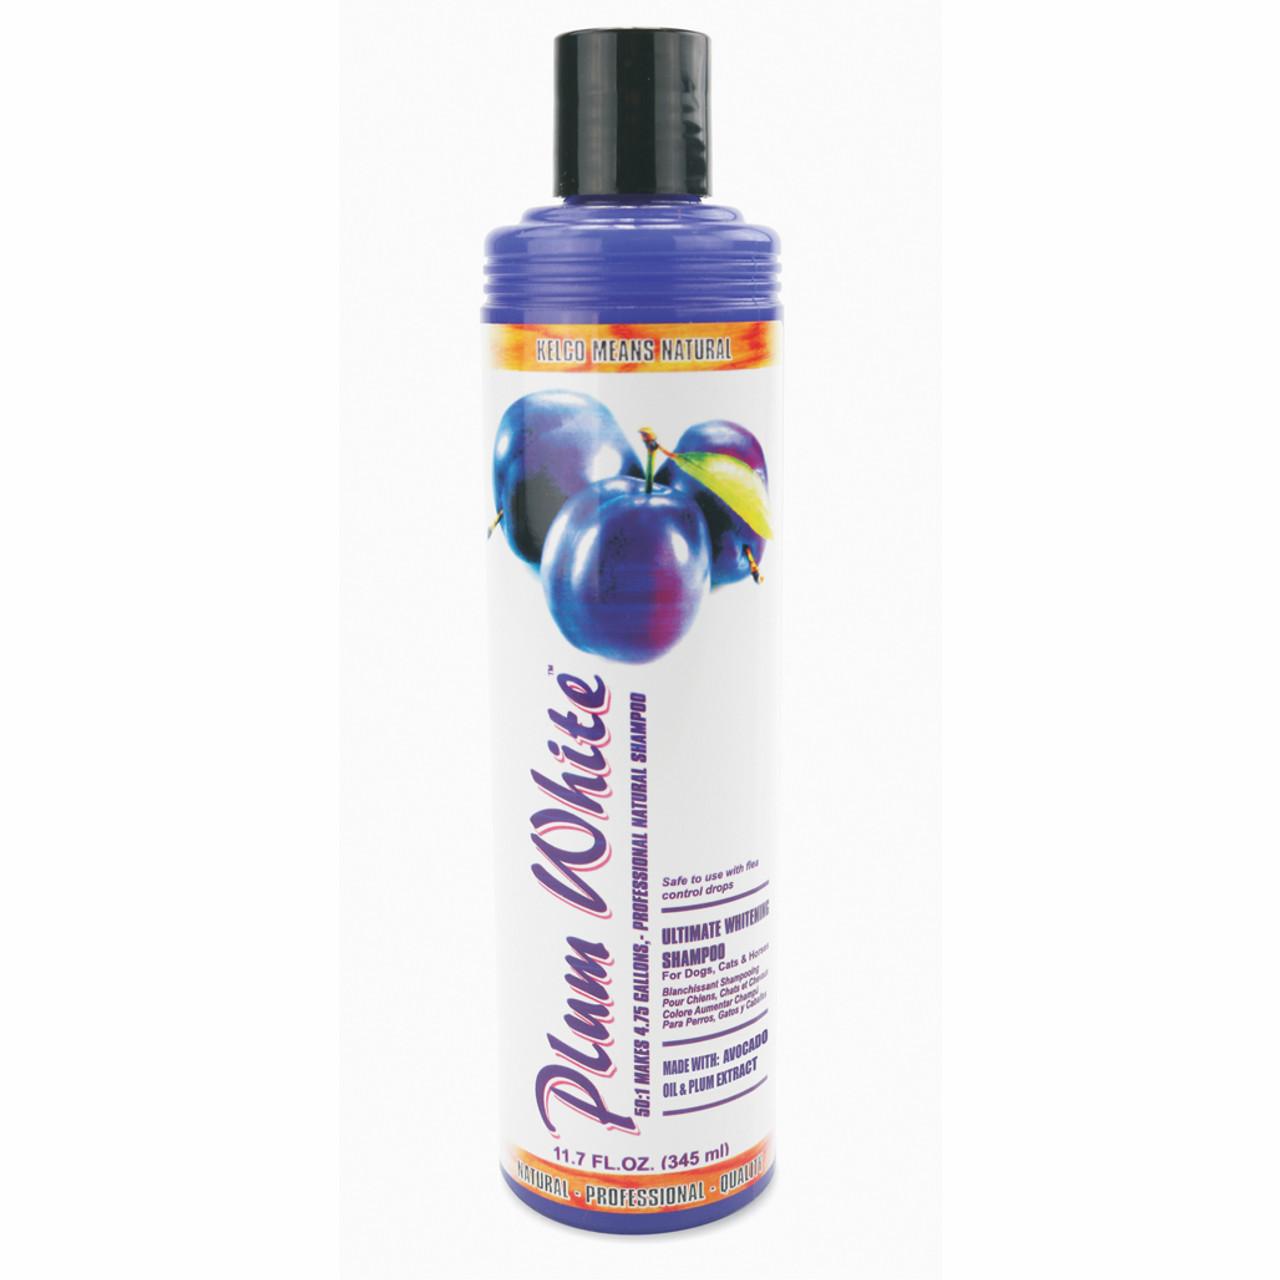 Kelco Plum White 11.7 oz Shampoo